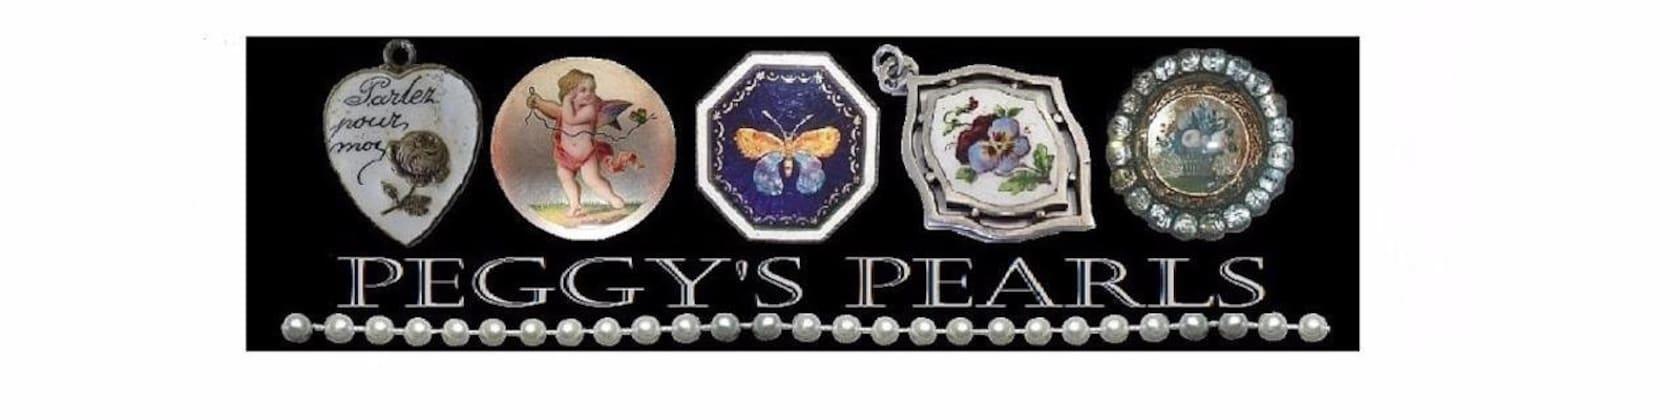 Vintage Amp Antique Jewelry Buttons Textiles Amp Decor By